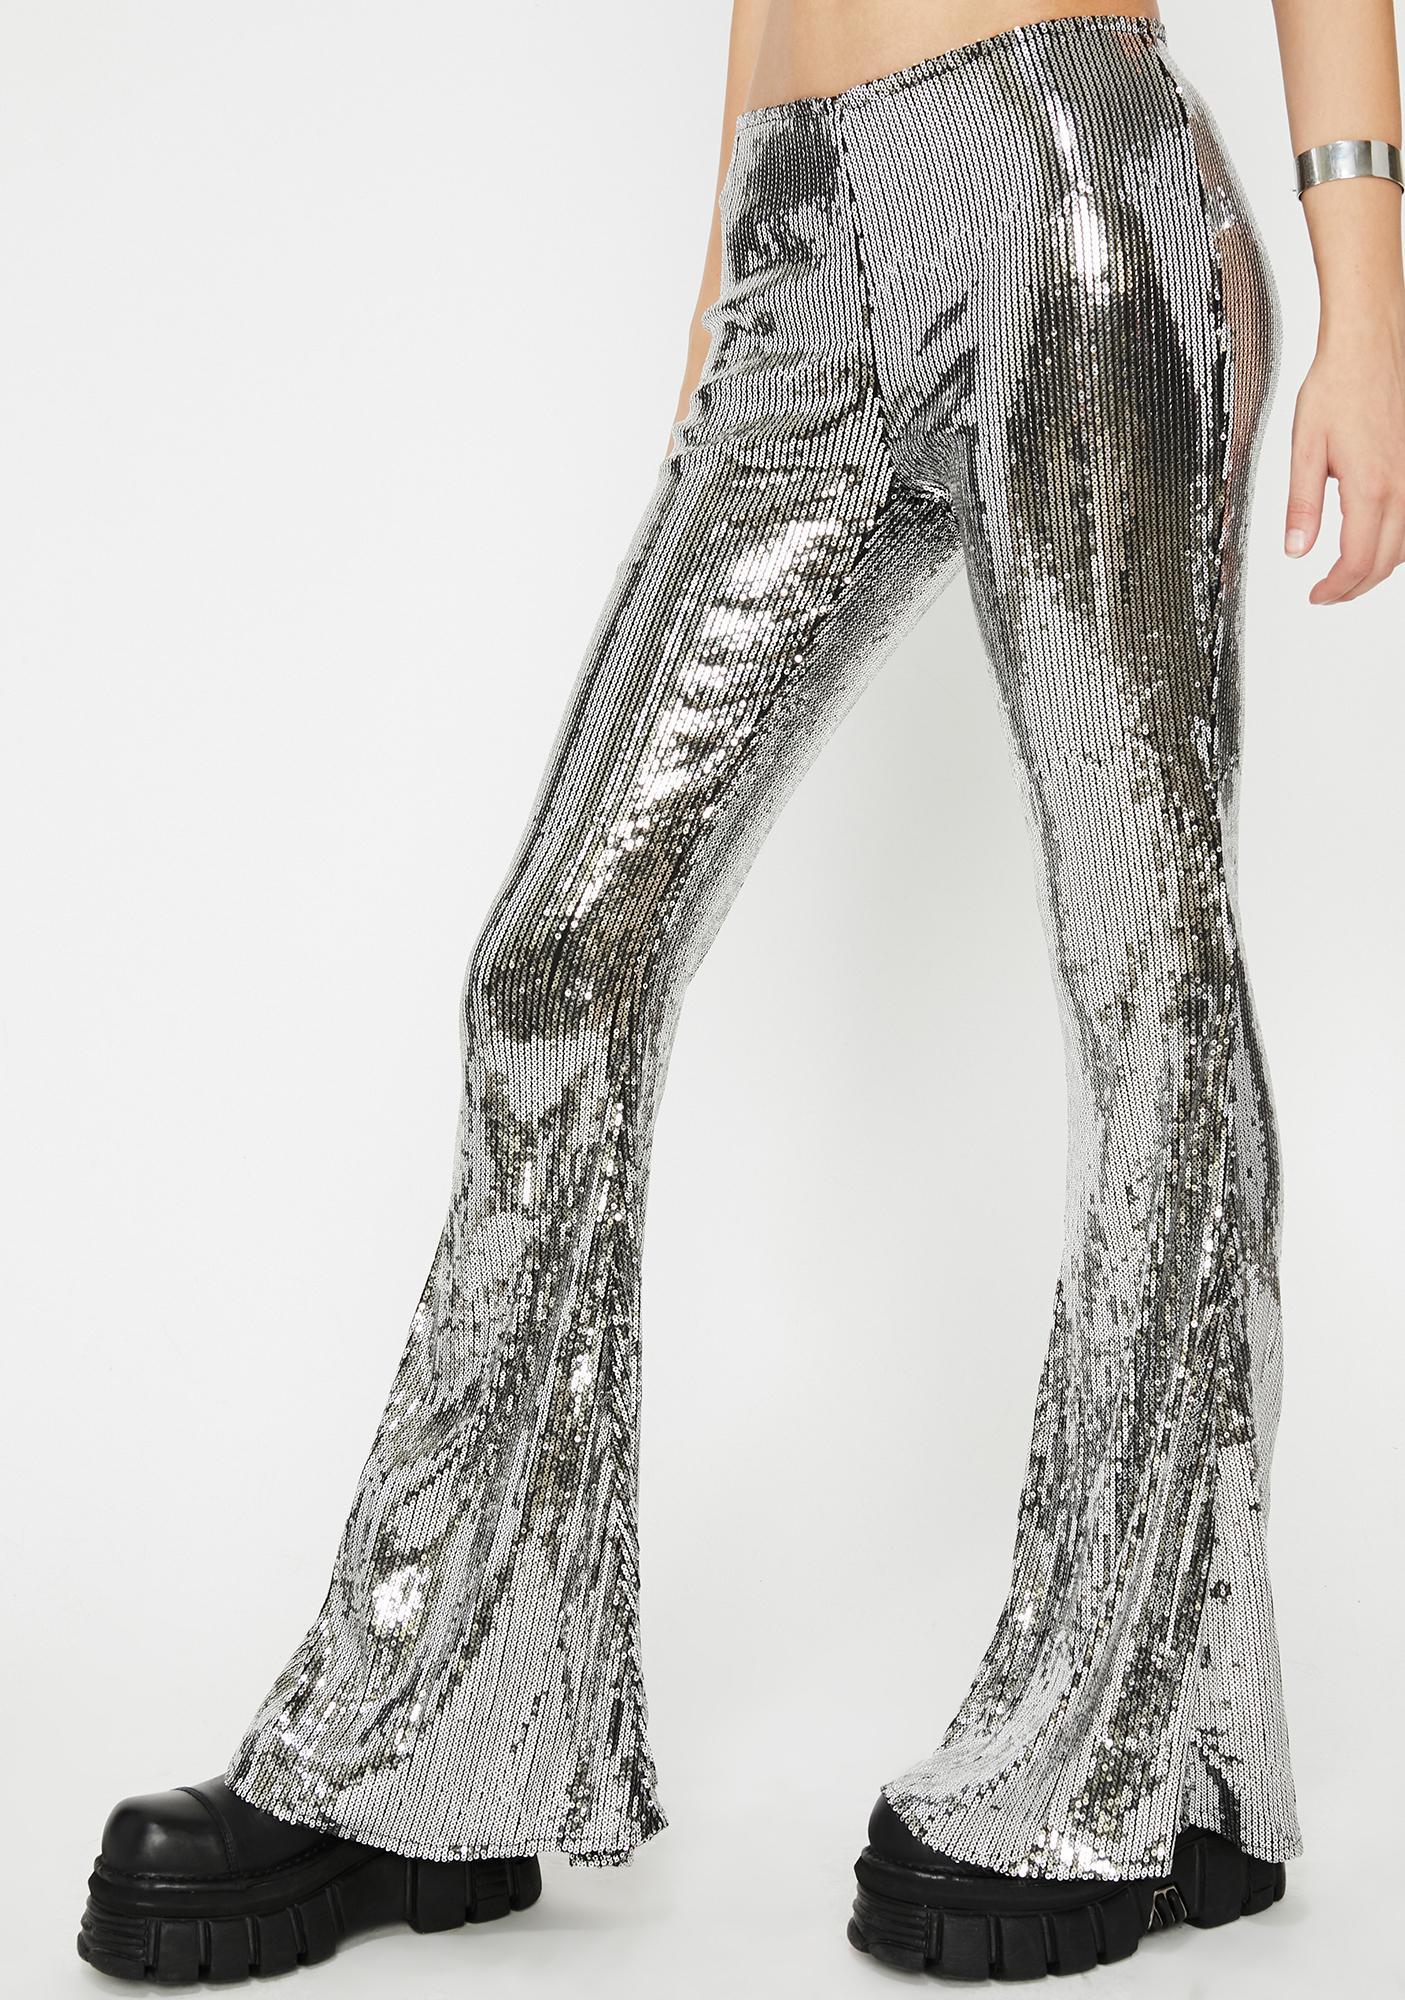 Chrome Illuminated Euphoria Sequin Pants